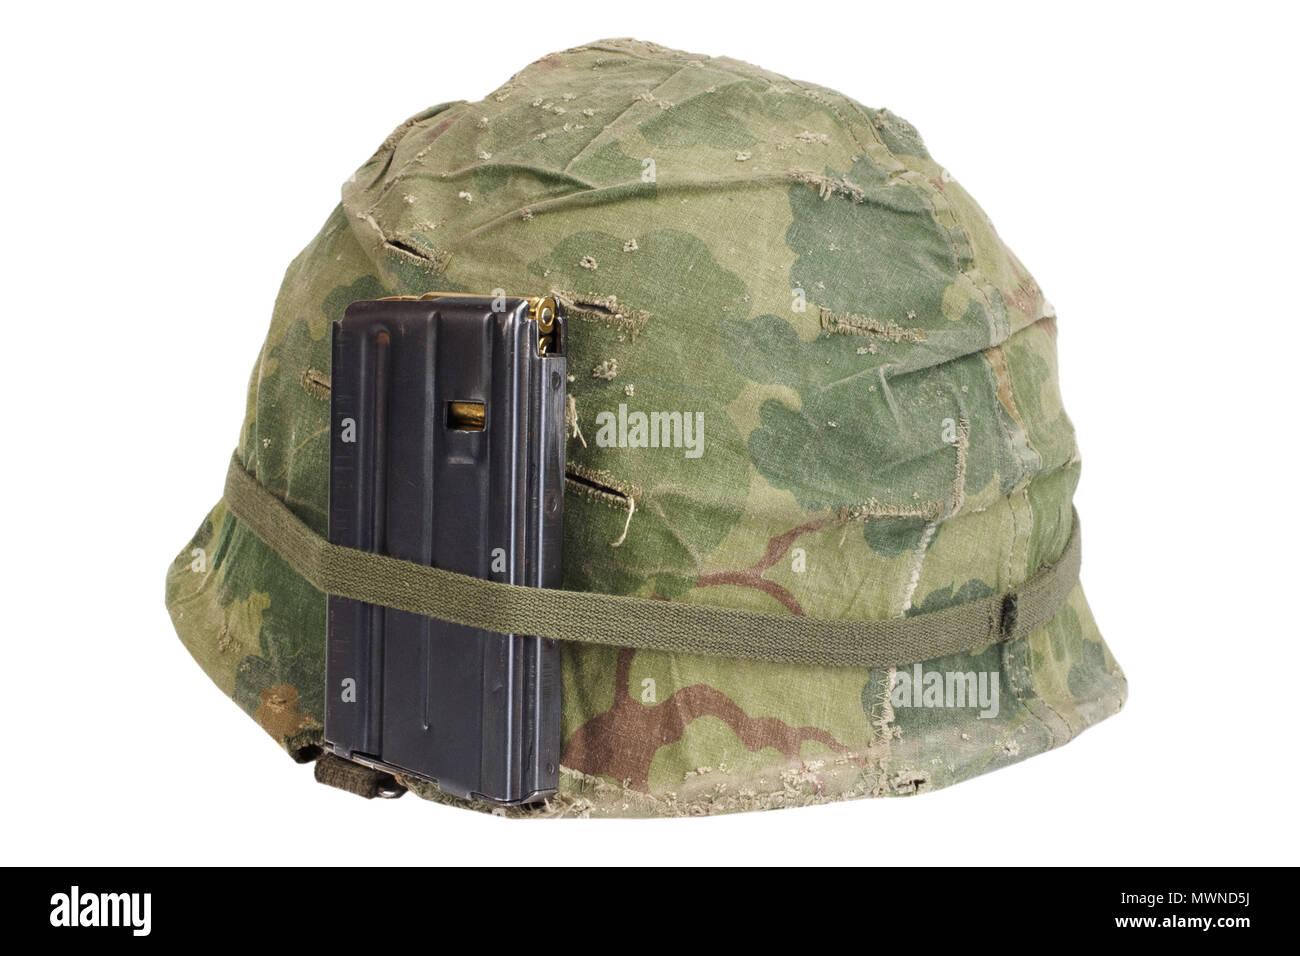 Us Army Helmet Vietnam War Period 1964 1974 Stock Photo Alamy